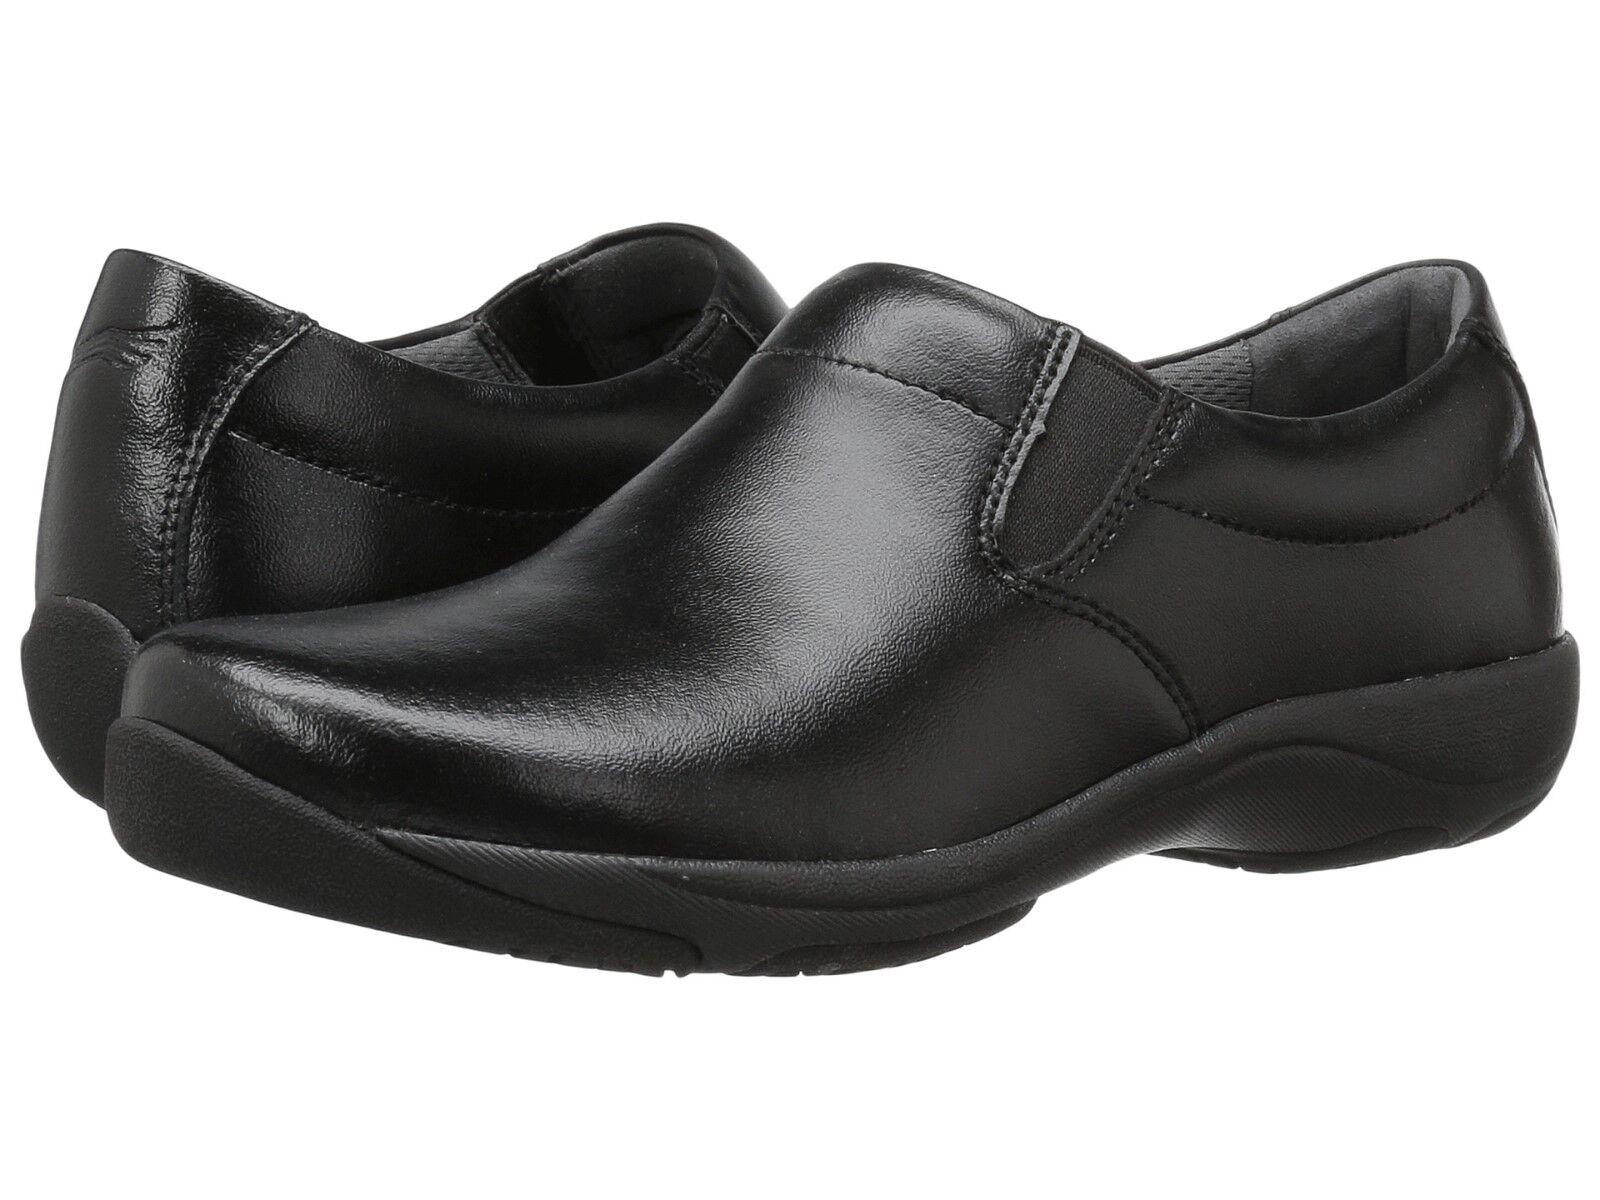 Women's Dansko Essex Essex Dansko SlipOn Shoe Clogs Ellie Black Leather bba11f